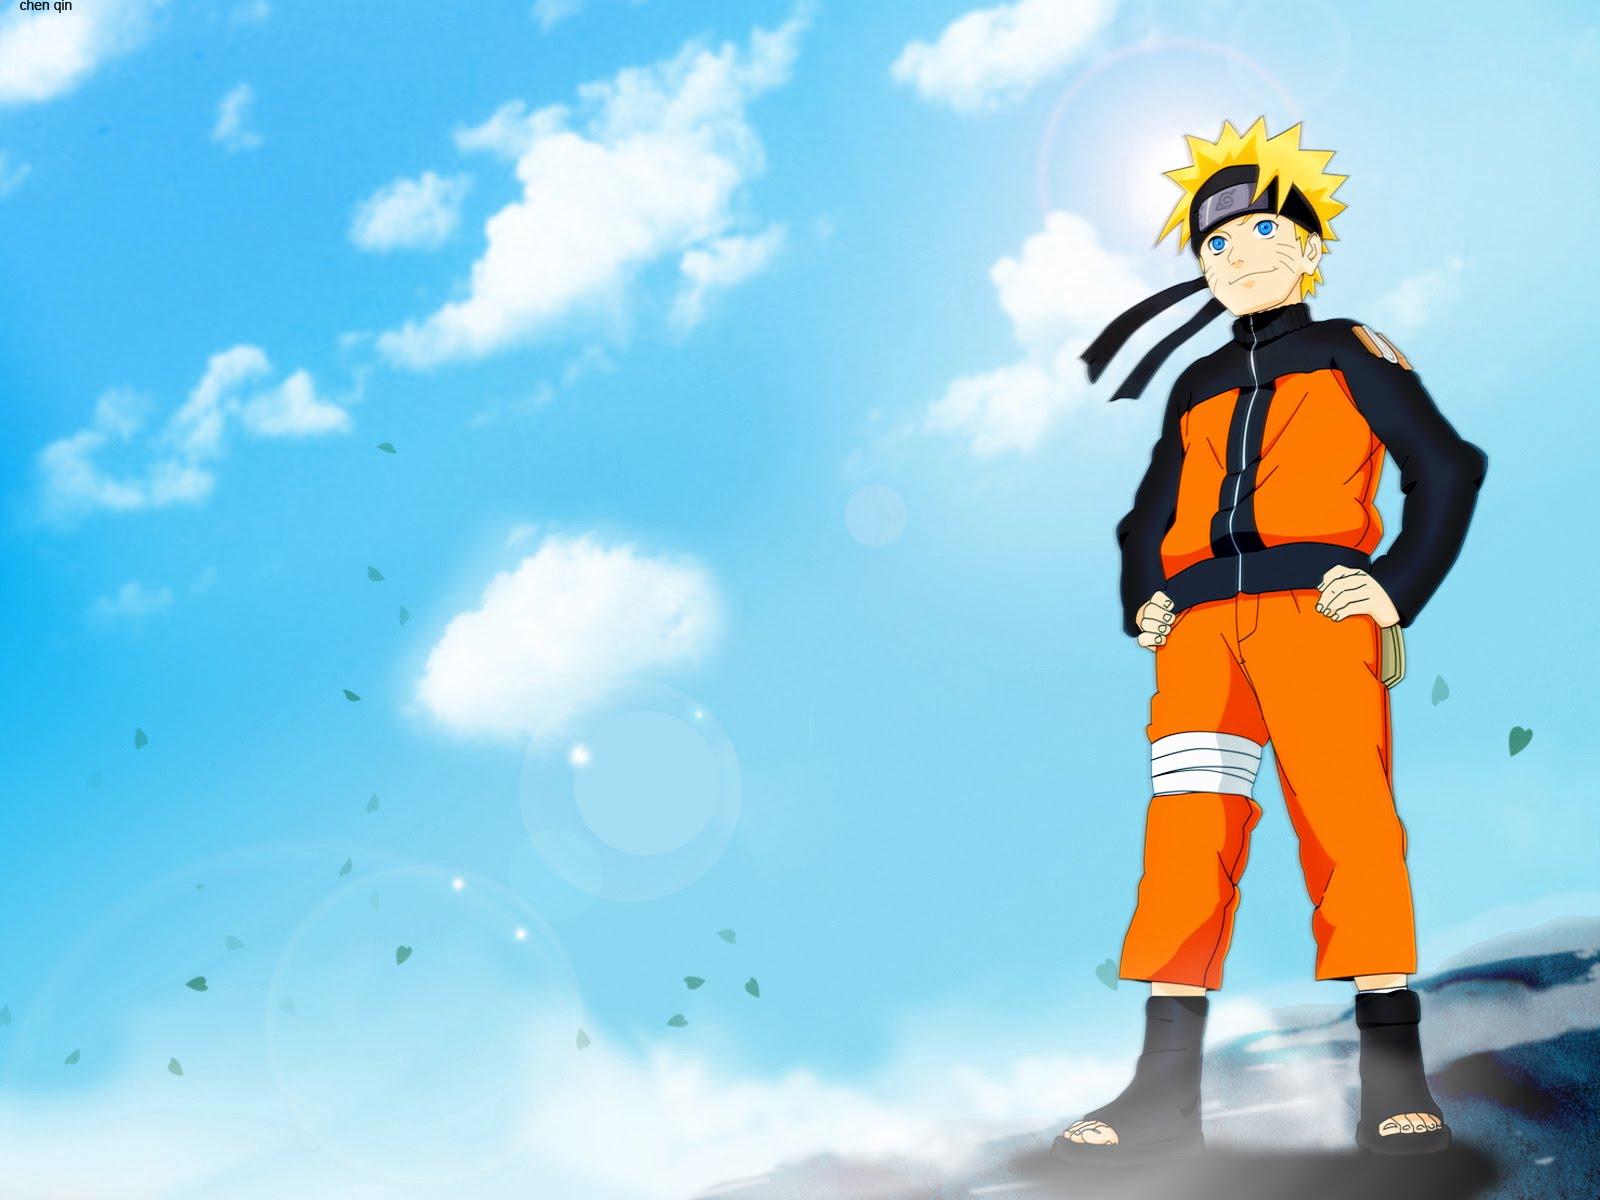 Wallpaperss hd naruto wallpapers - Naruto images and wallpapers ...